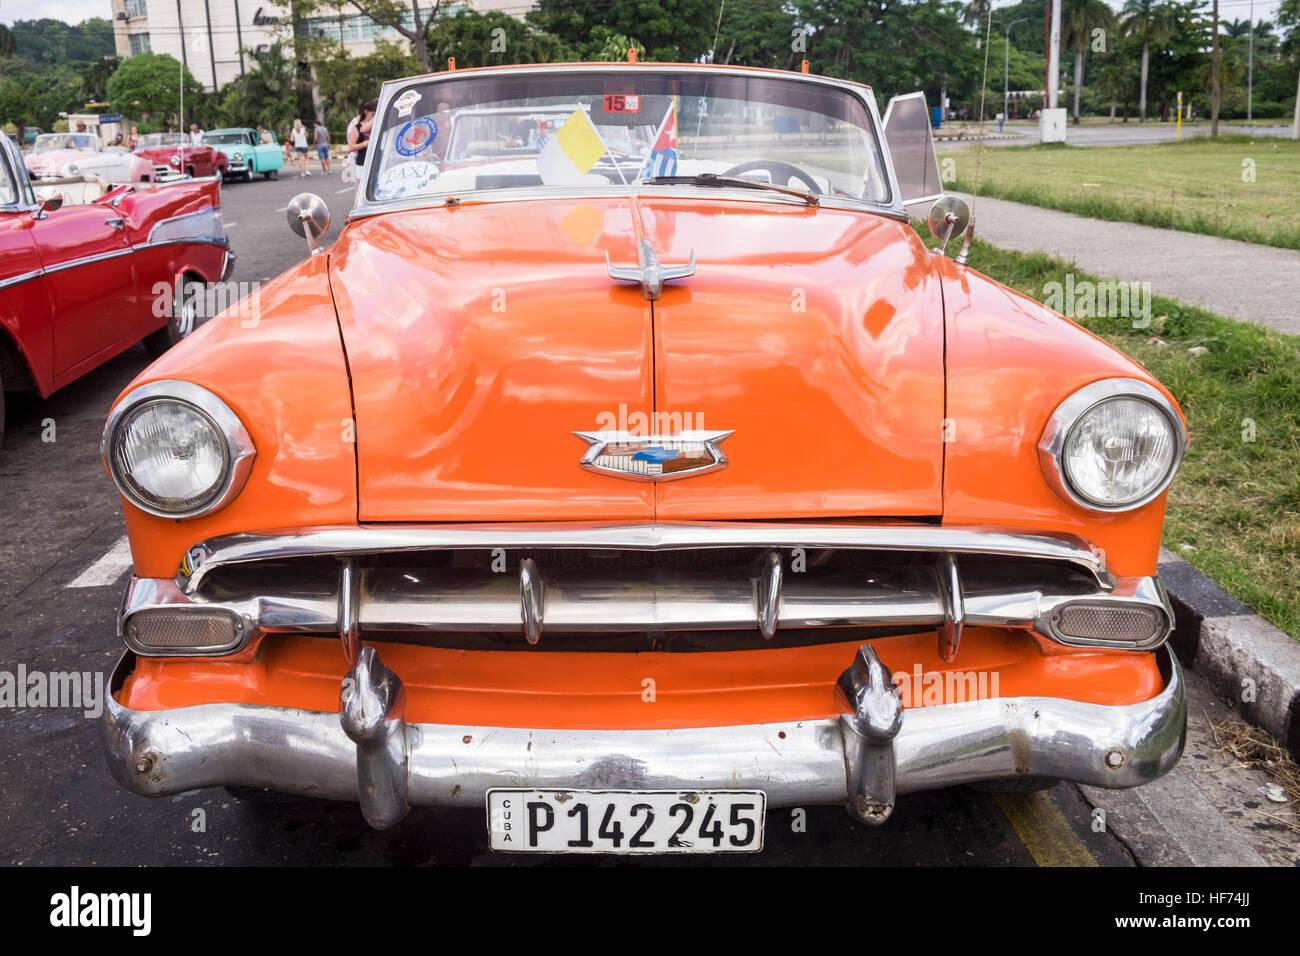 Old American Chevrolet 1950s cars in La Havana, Cuba Stock Photo ...